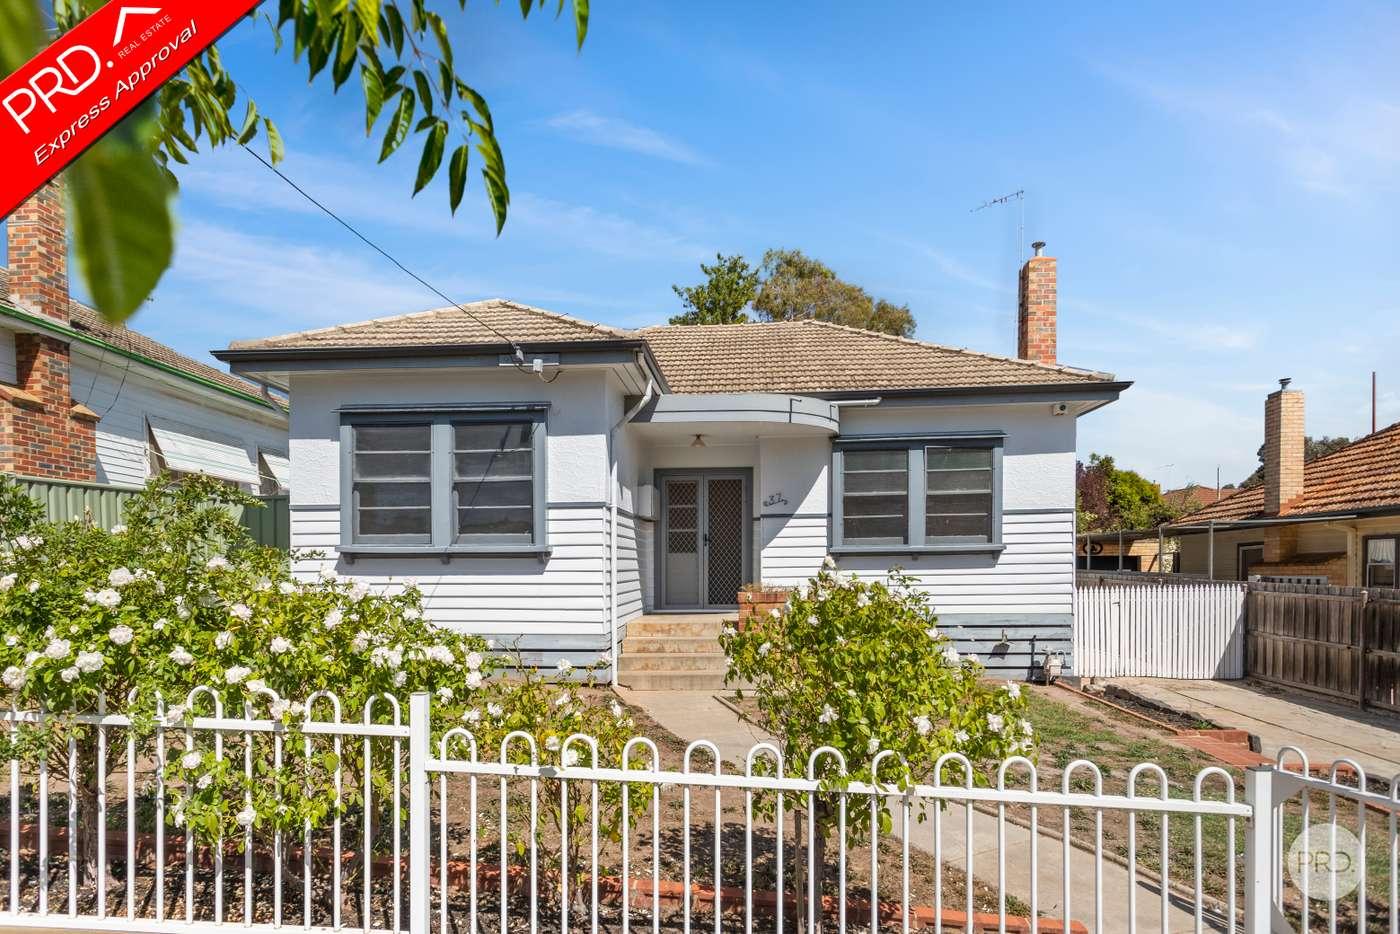 Main view of Homely house listing, 37 Bayne Street, North Bendigo VIC 3550